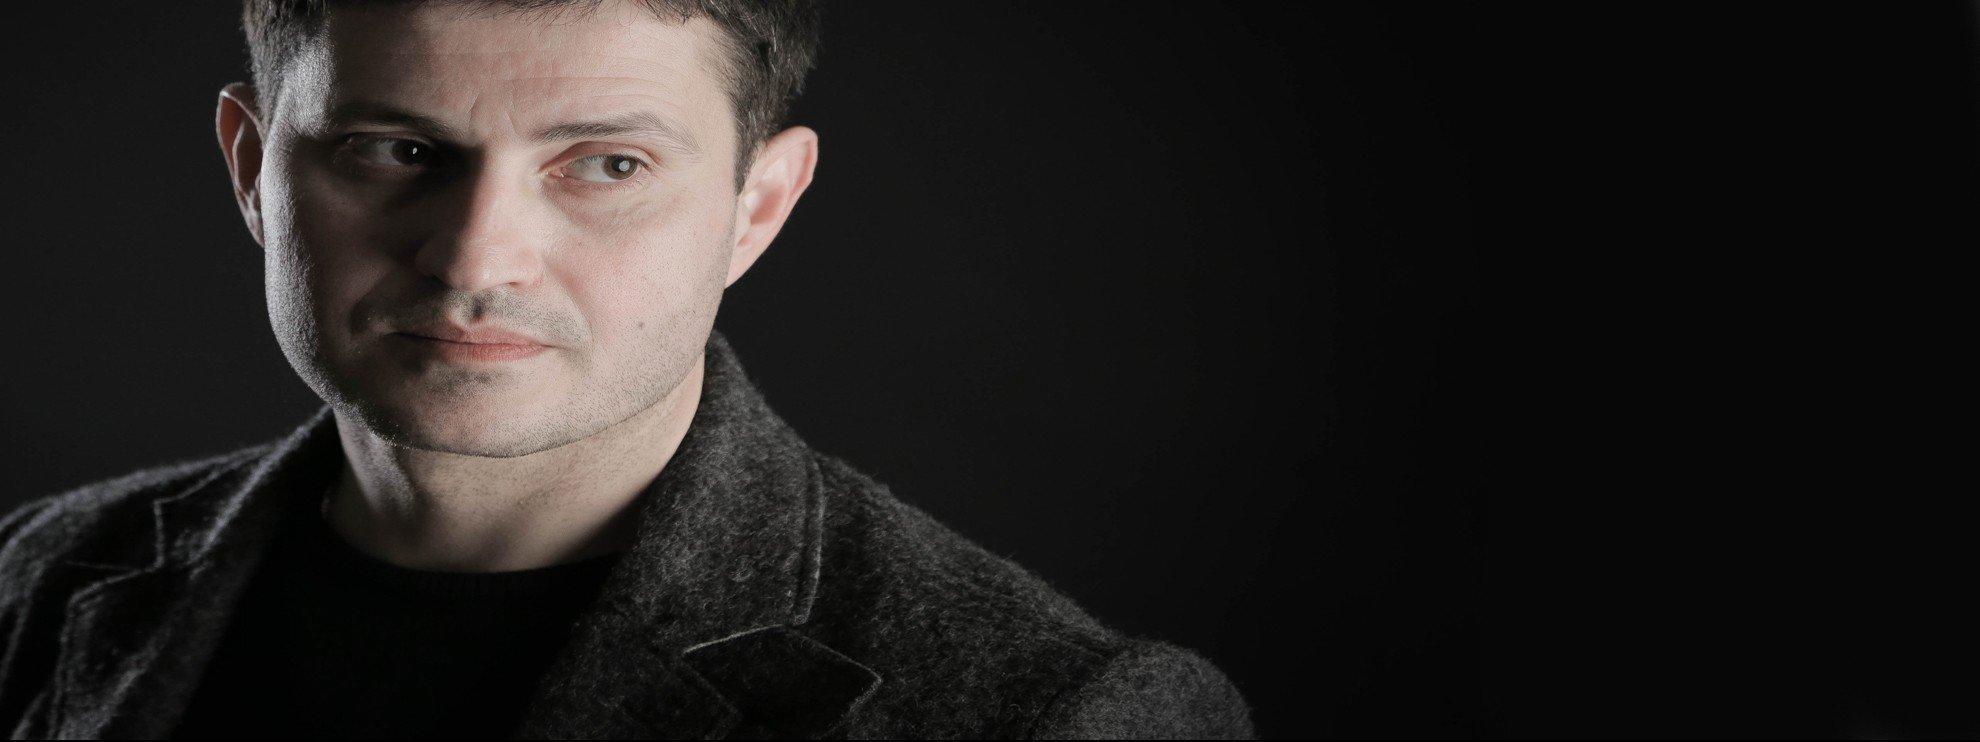 performer Ahtem Seitablayev